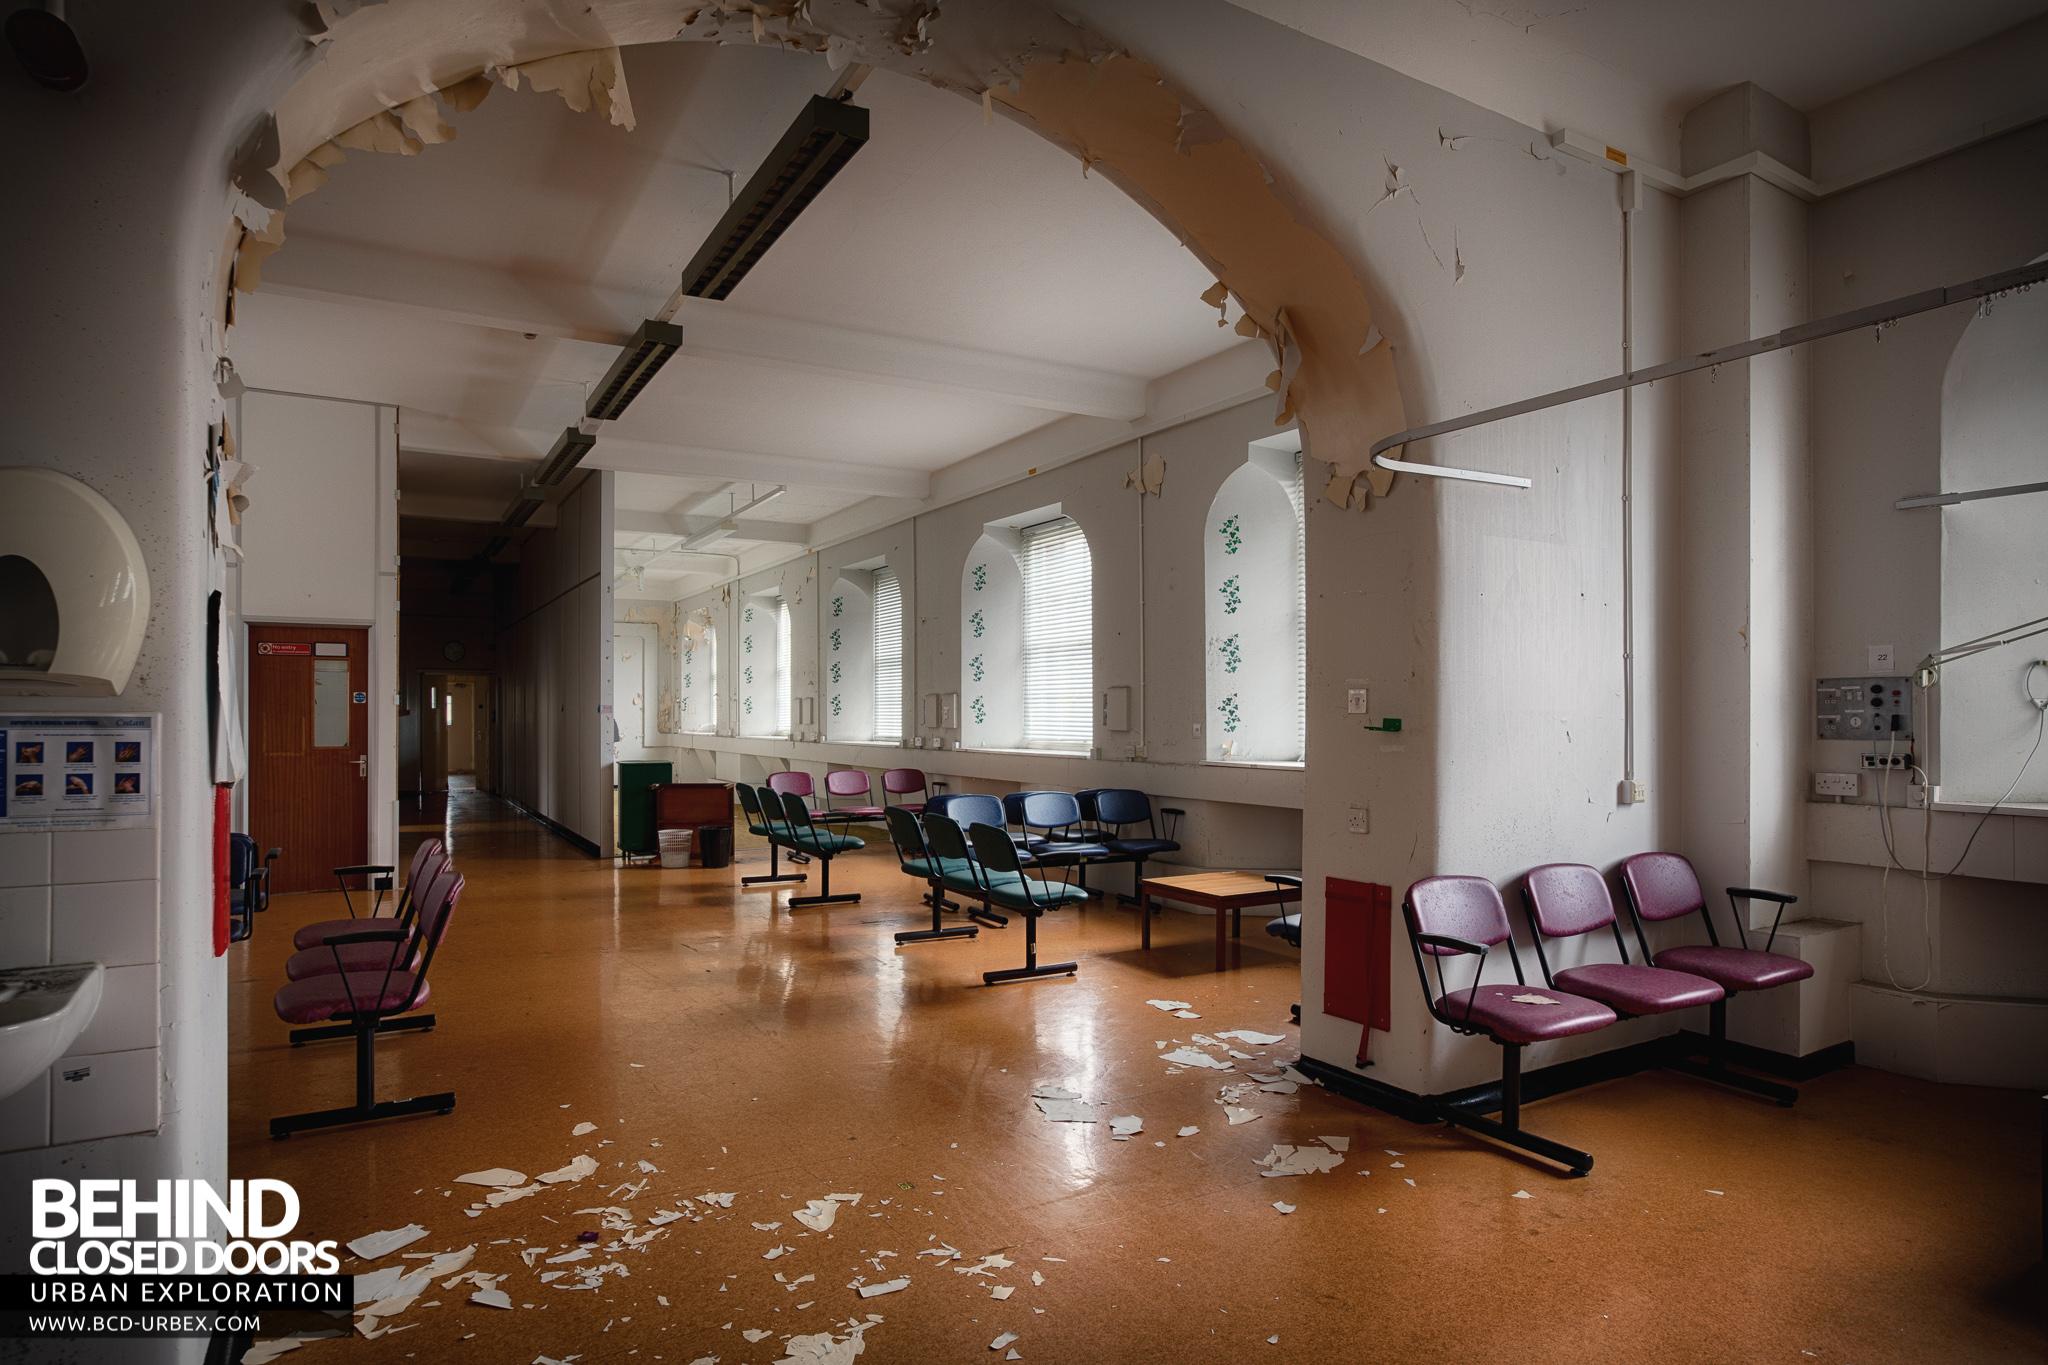 Royal Naval Hospital Haslar Gosport Uk 187 Urbex Behind